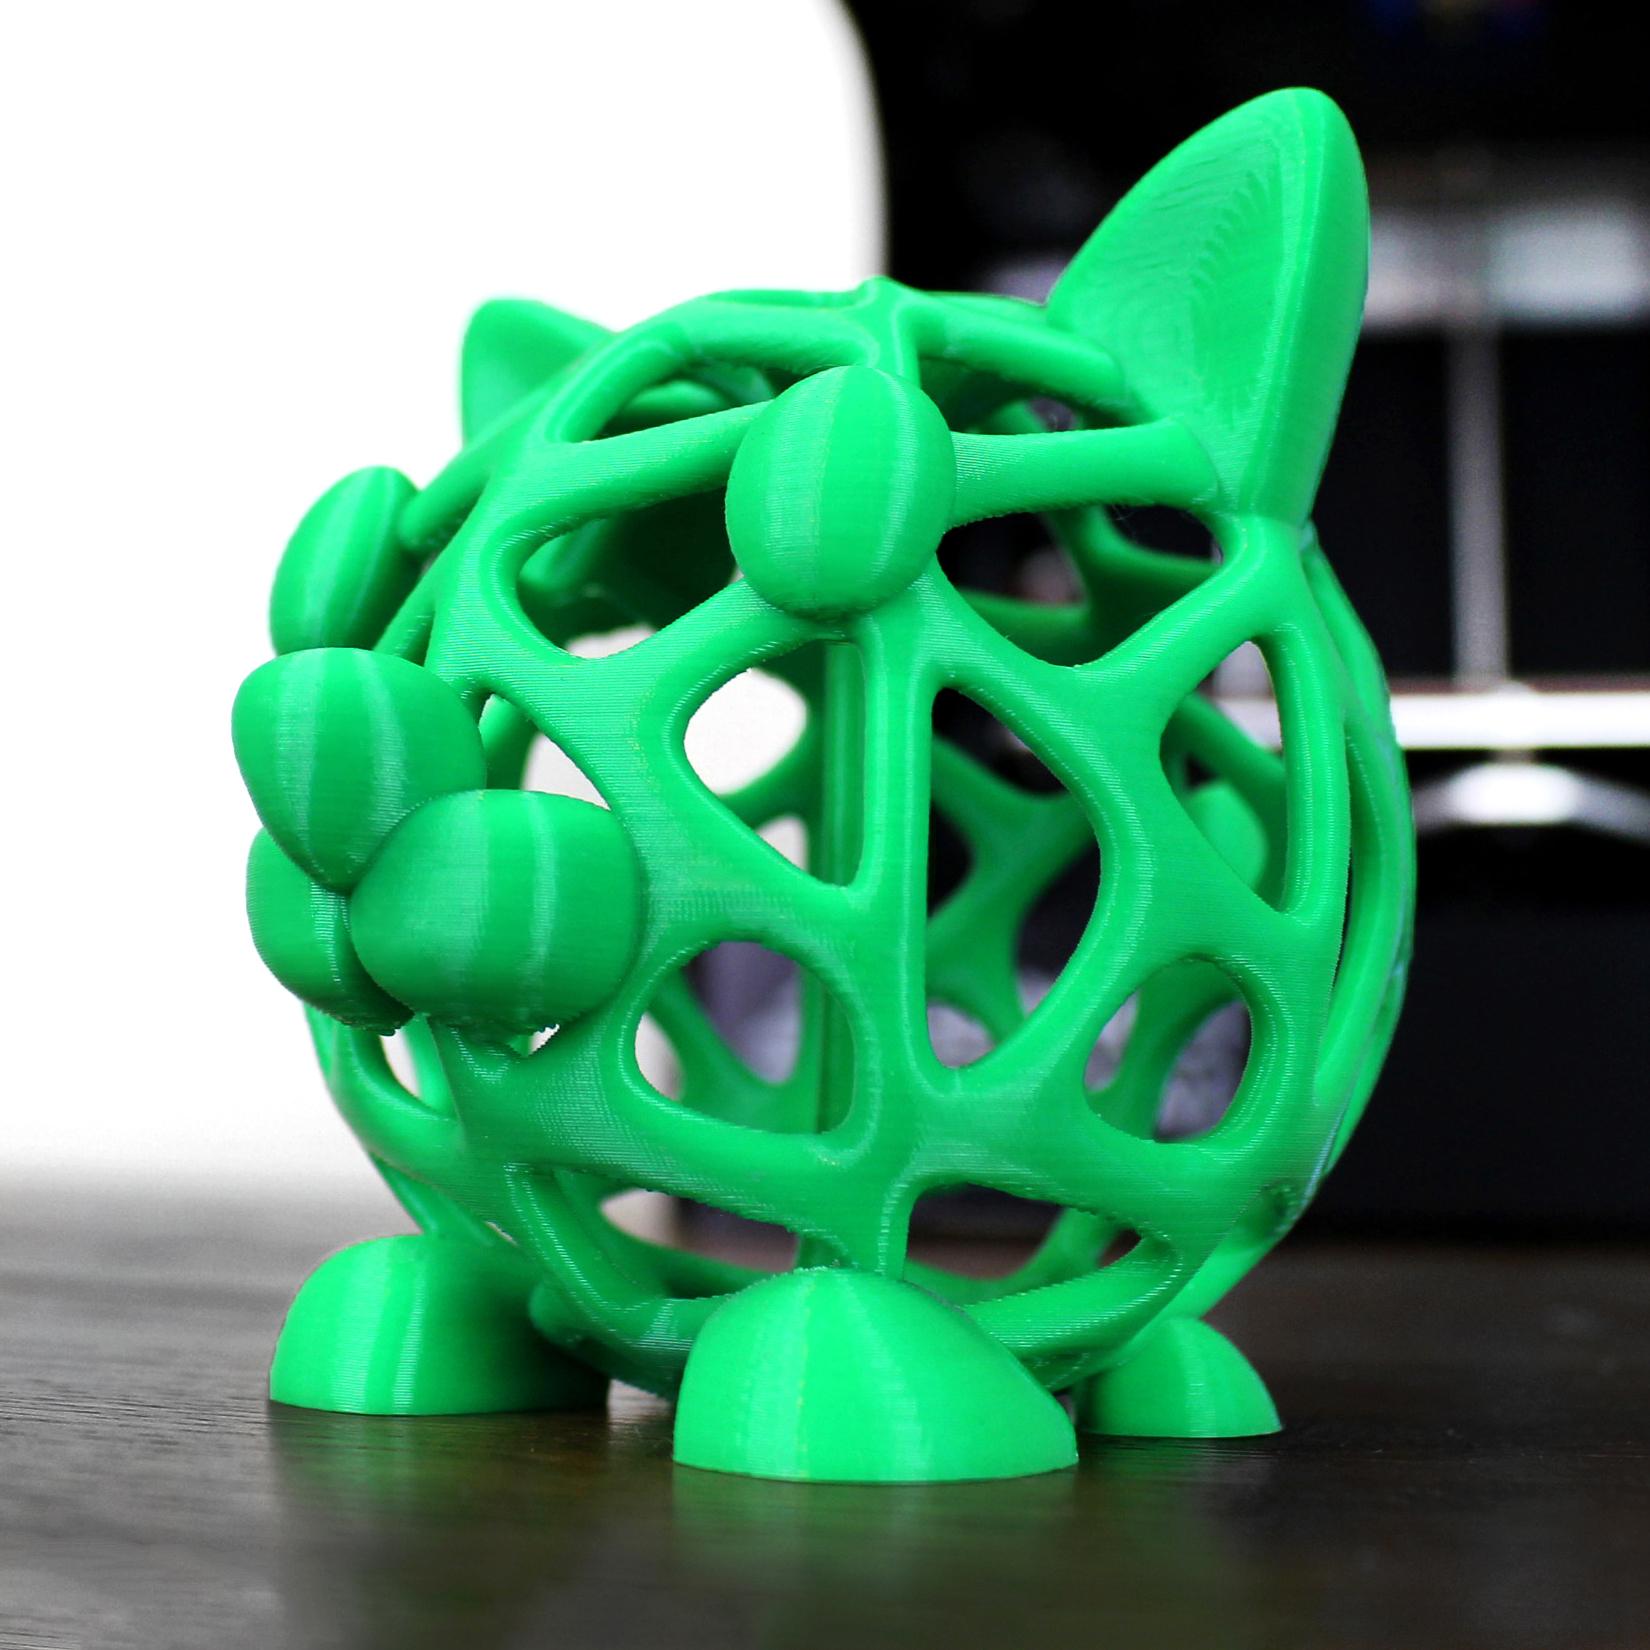 Lepton2 Dual 3Dプリンター ヒーテッドベッド(HBP)・Simplify3Dソフト 標準搭載 - 画像3